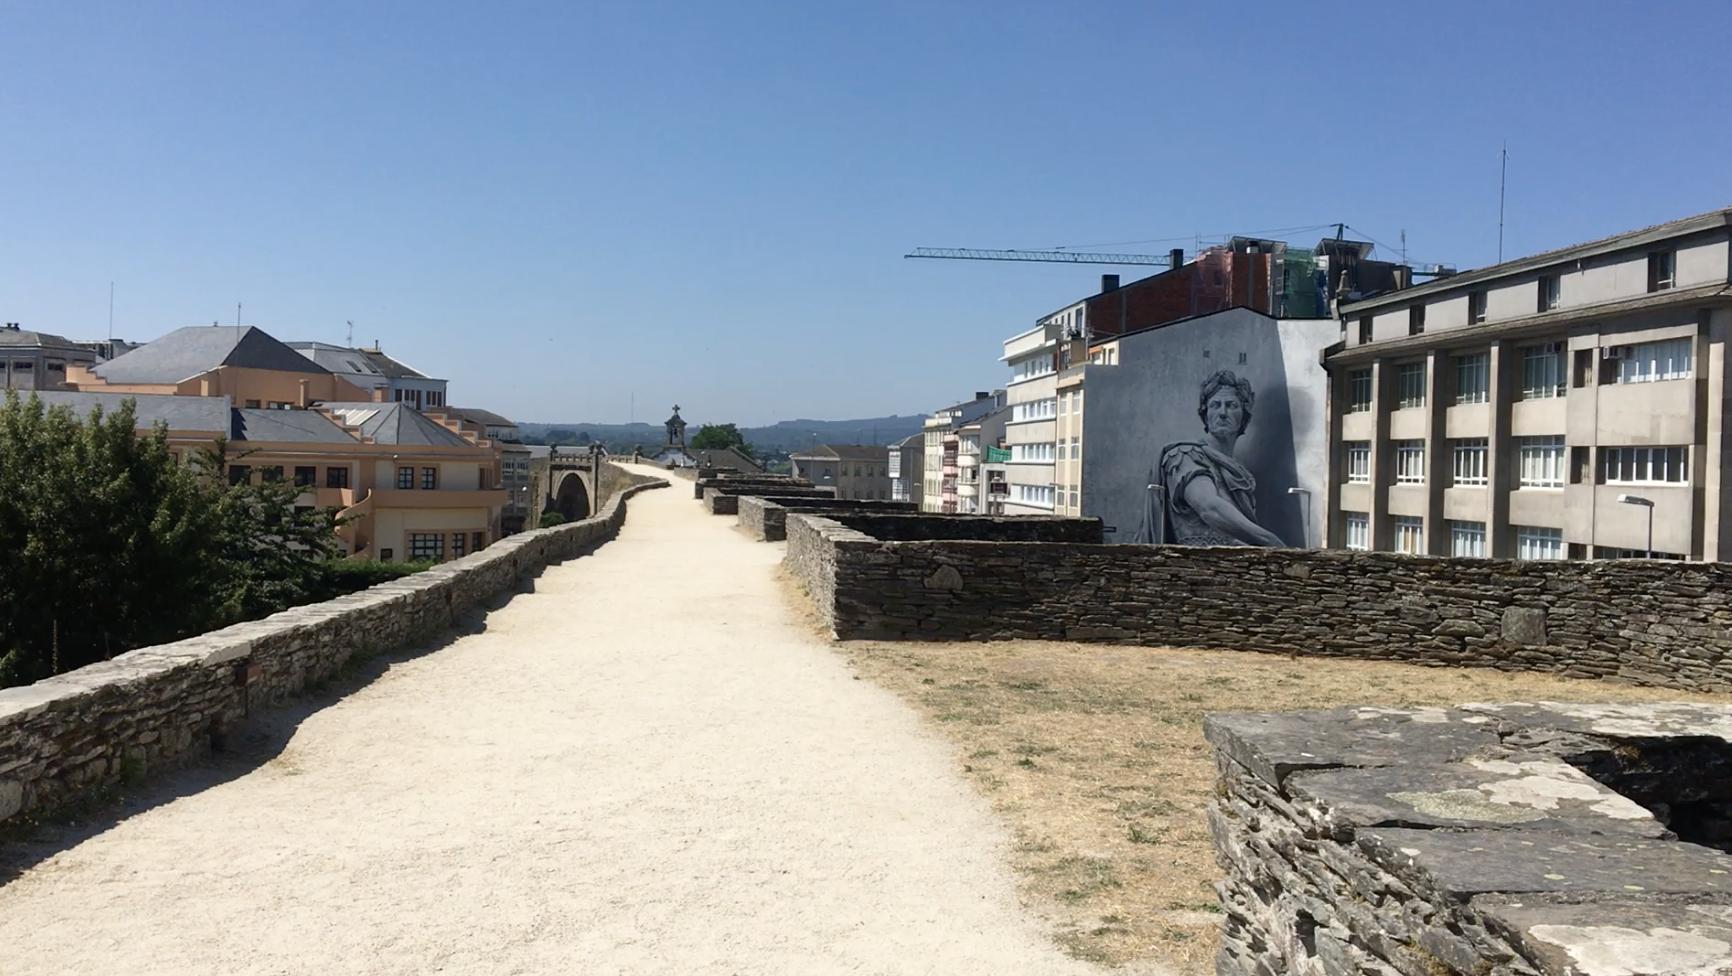 Up on the Roman walls, Lugo, Camino Primitivo